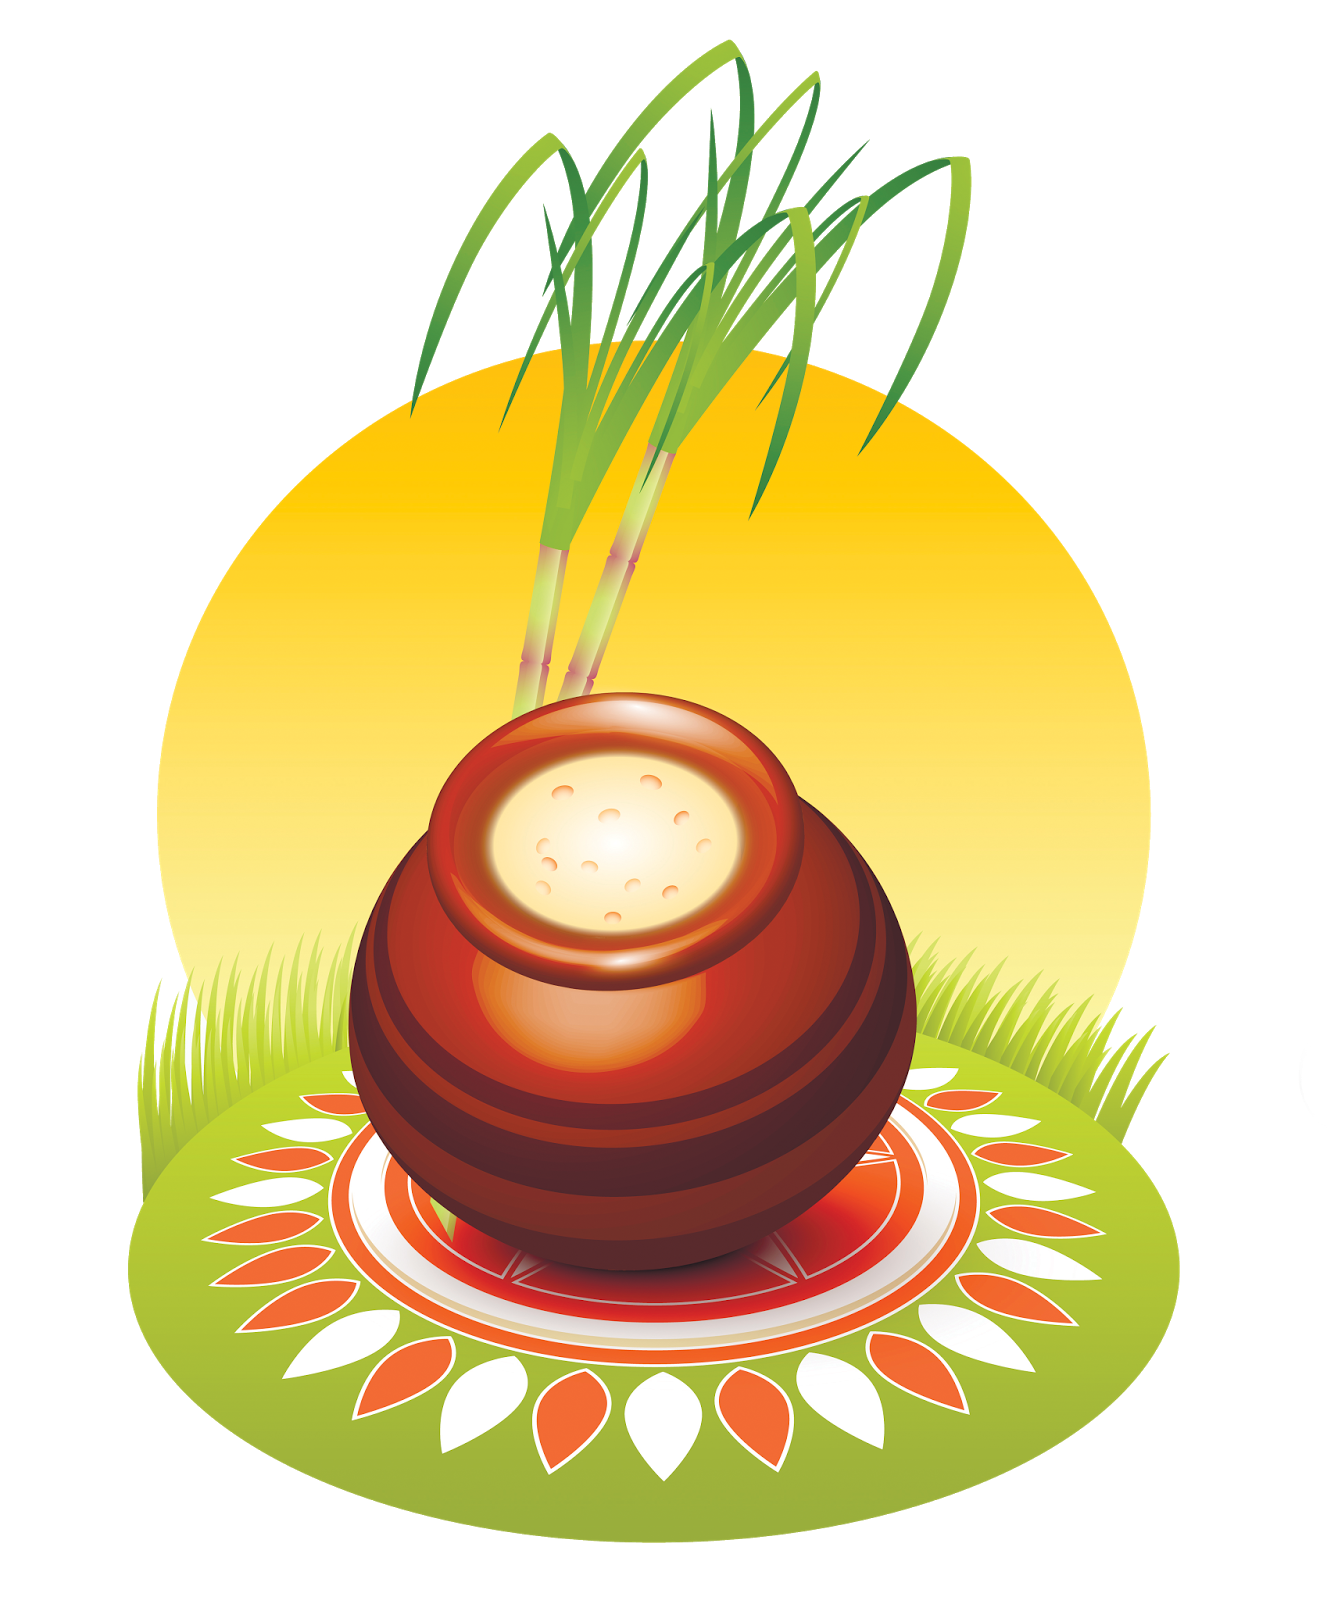 Sankranti Muggula Kundalu (Pots) Png Format In Hd Quality - Pot, Transparent background PNG HD thumbnail